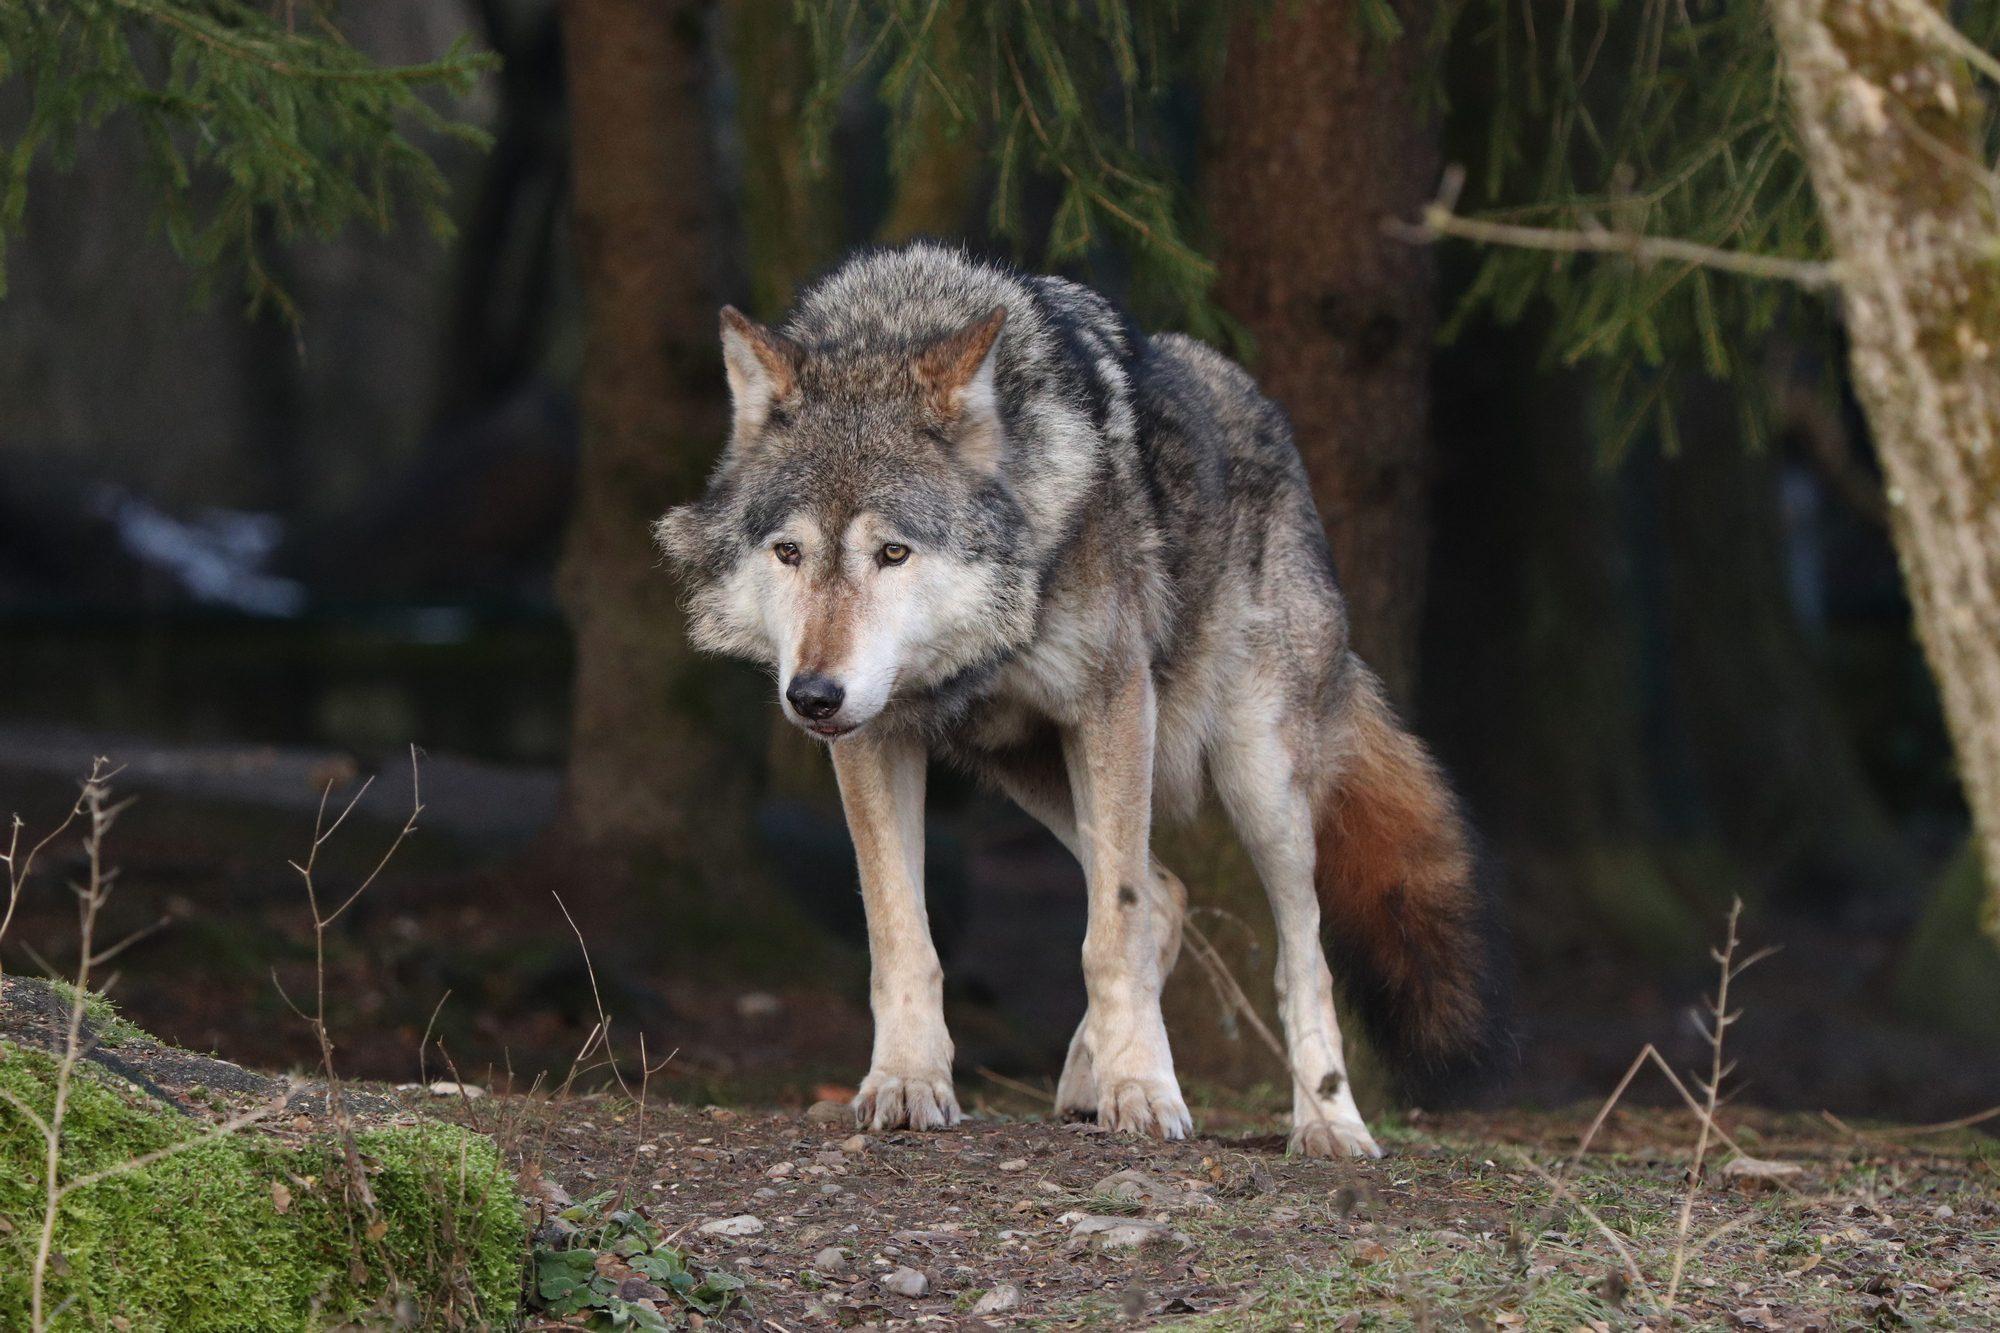 Europäischer Wolf im Tierpark Hellabrunn